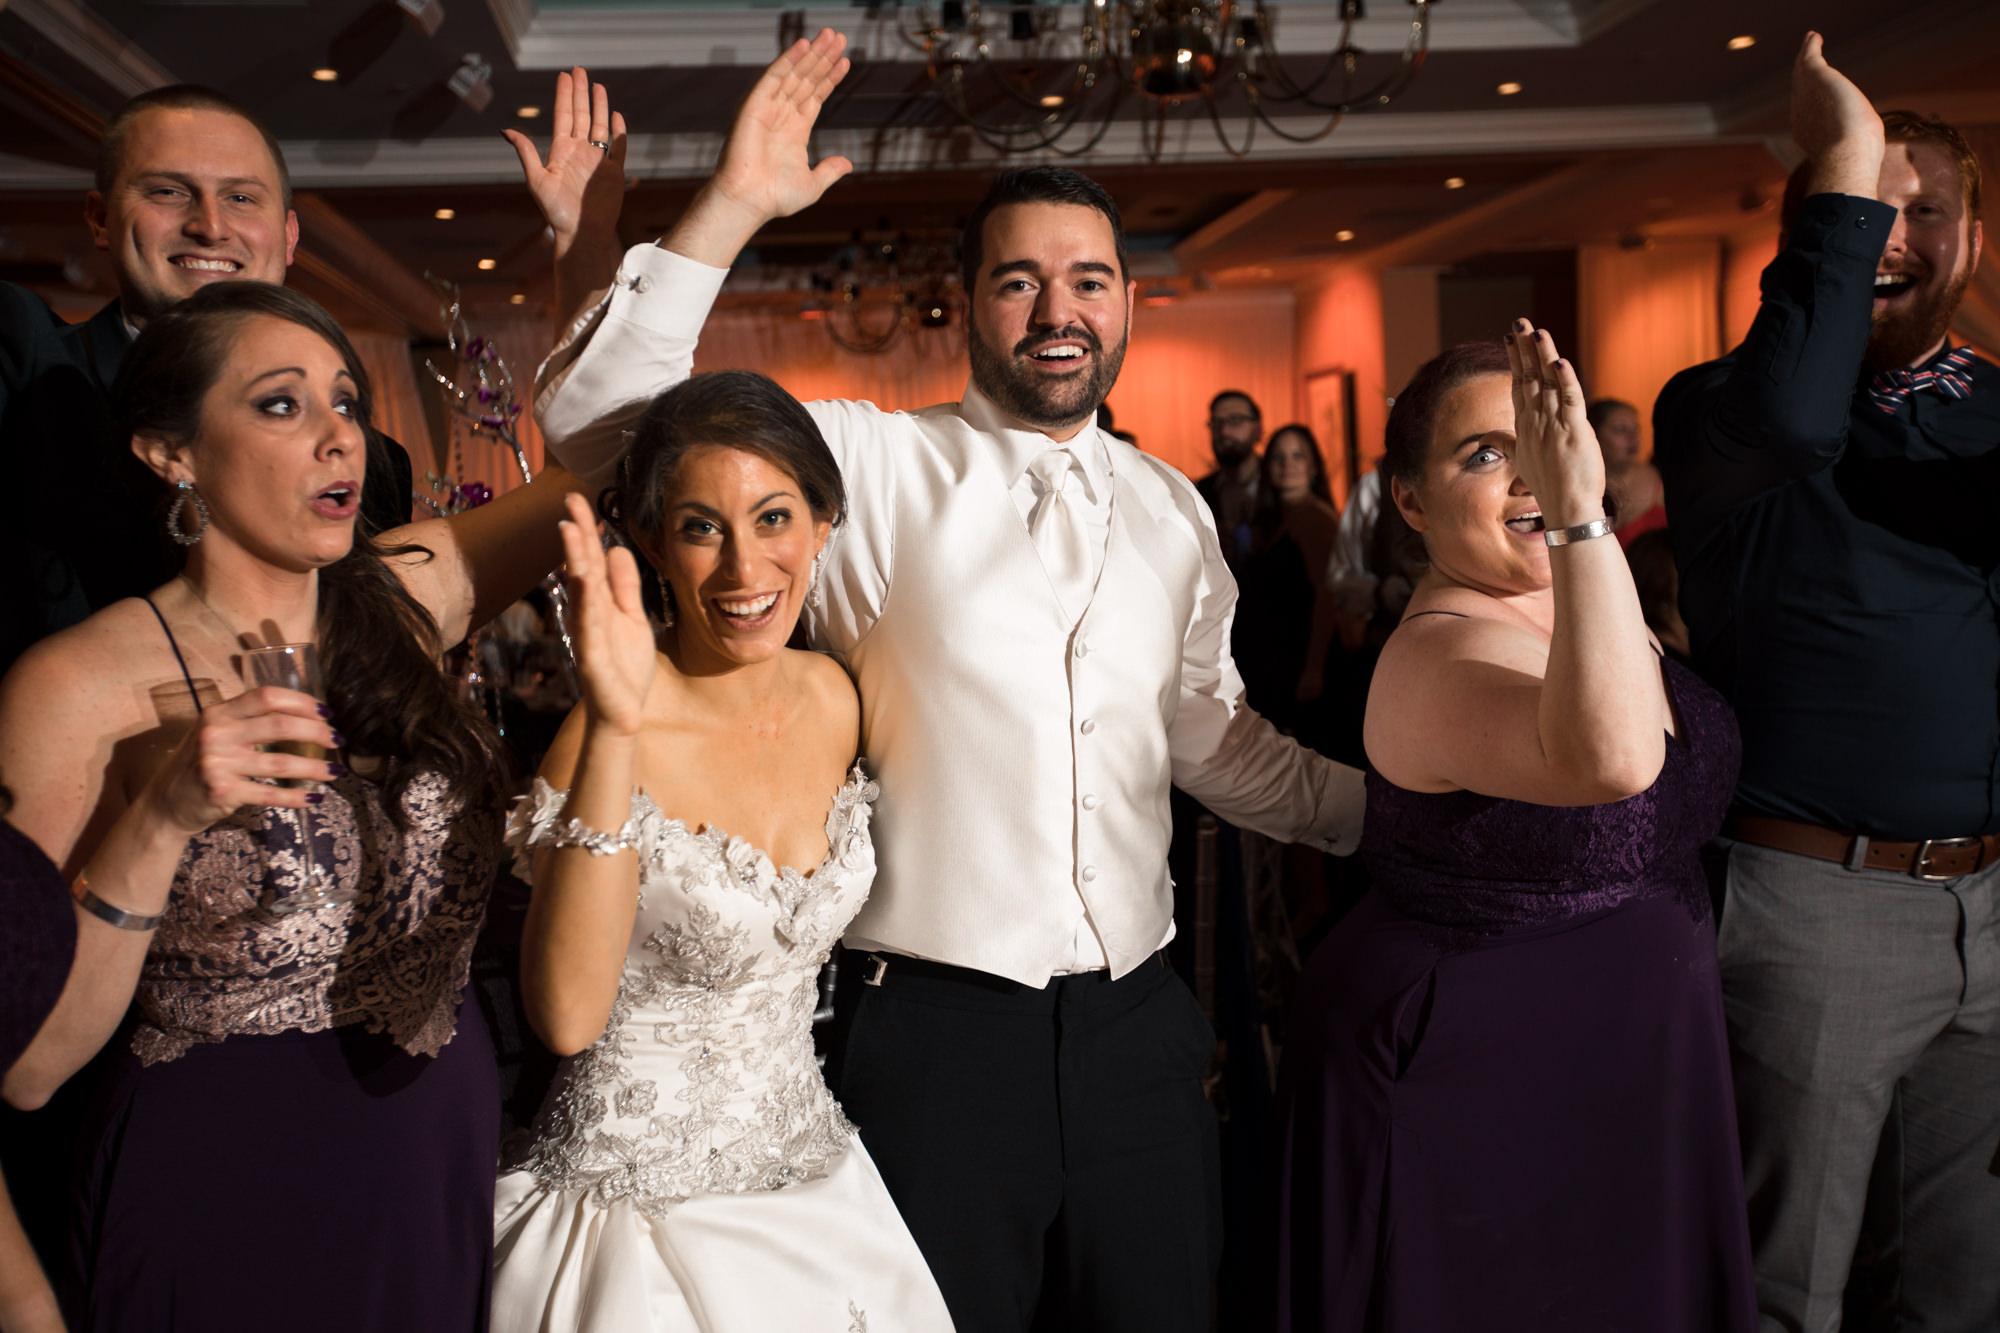 Benvenuto_Wedding_catholic_Florida_Bride-Groom-144.jpg